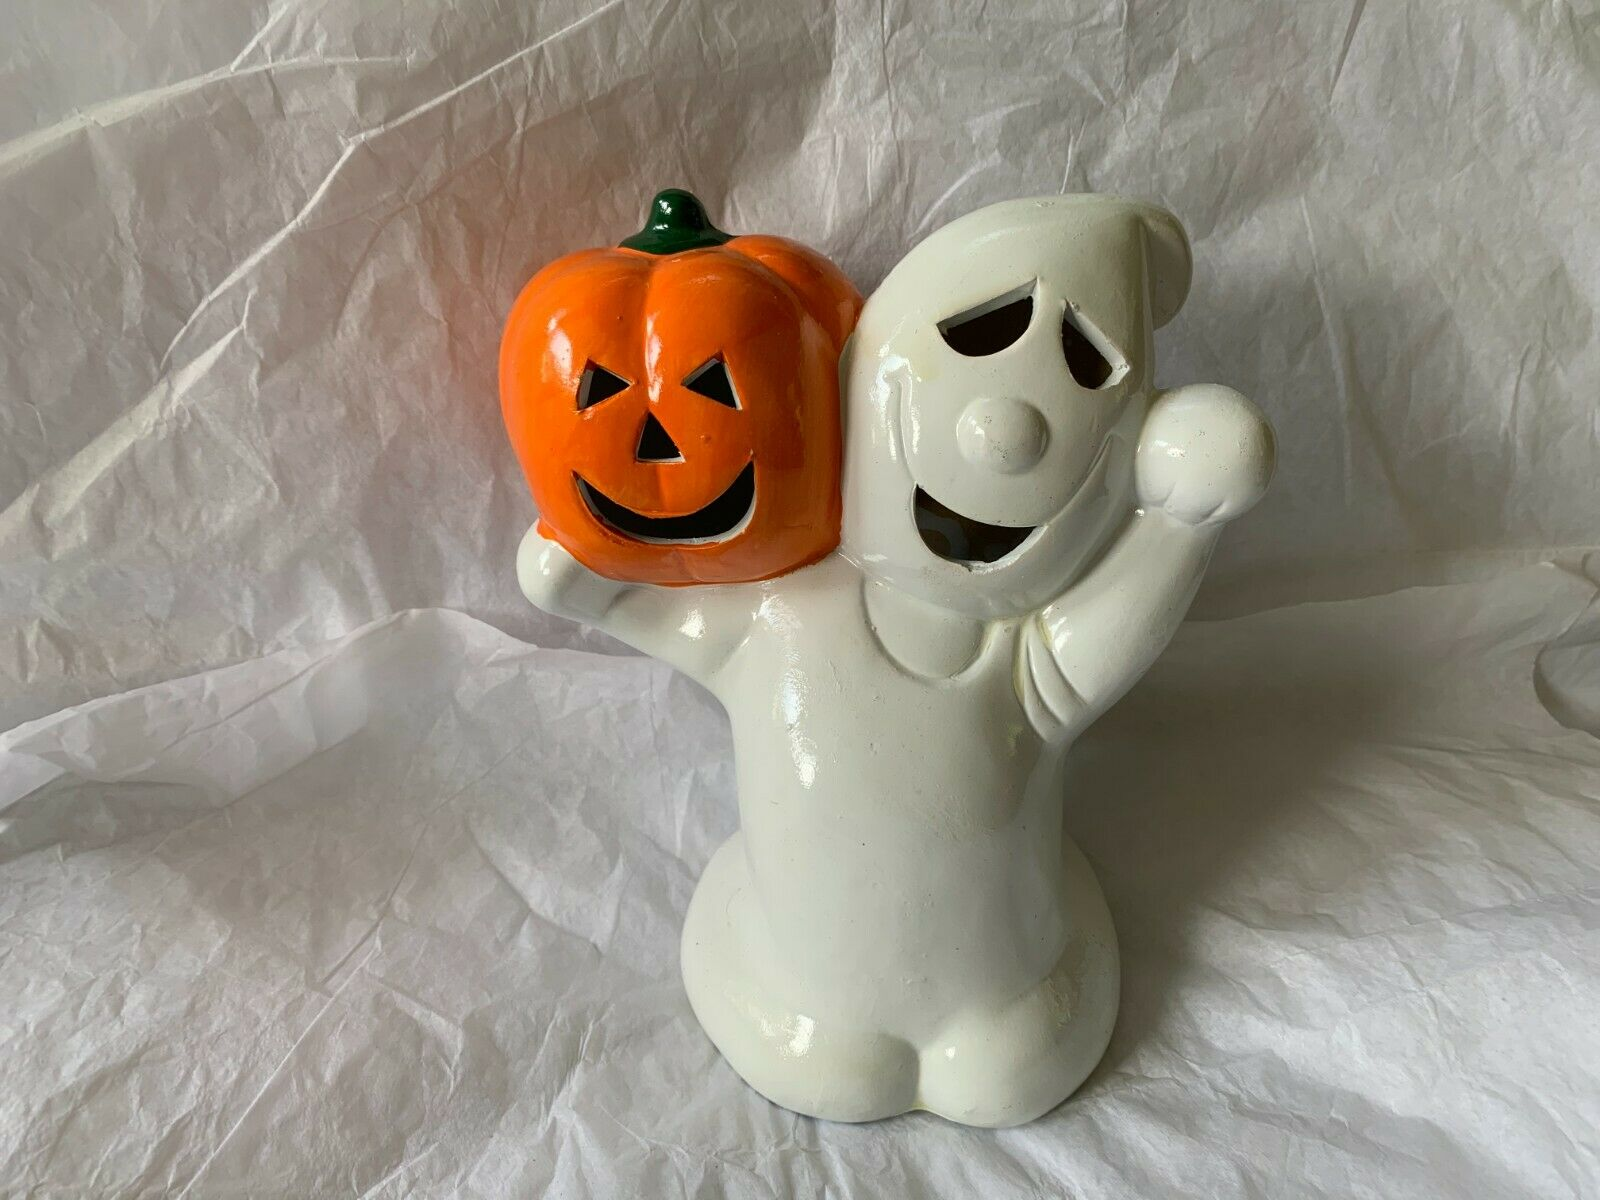 Vintage Earthenware Tealight Candle Holder Halloween Ghost With Pumpkin For Sale Online Ebay